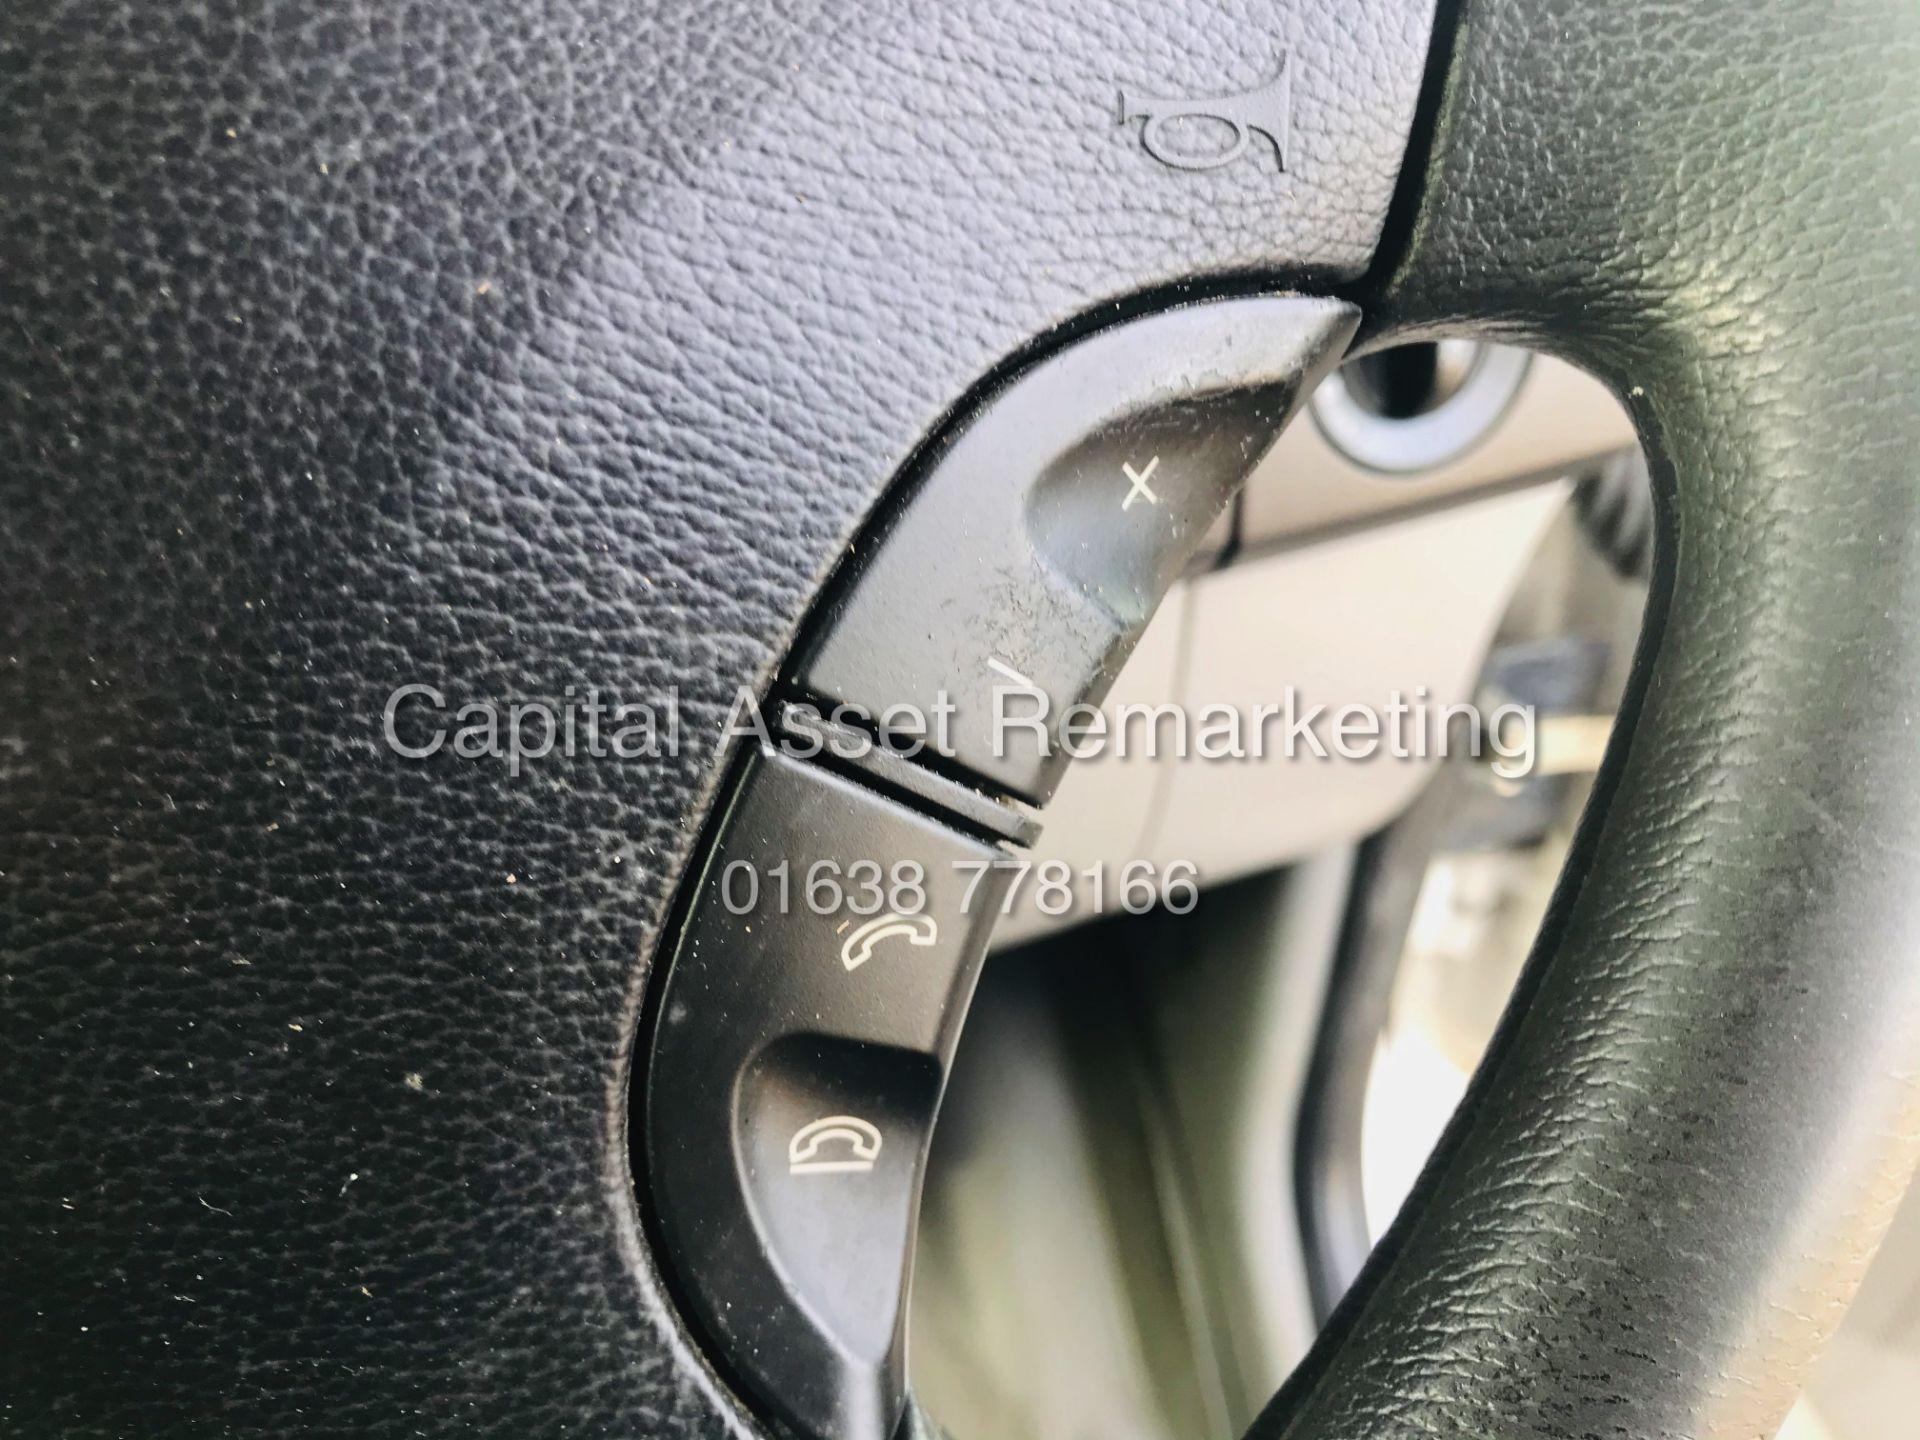 ON SALE VW CRAFTER 2.0TDI CR35 (15 REG) 1 OWNER - CRUISE - ELEC PACK - MULTIFUNCTION STEERING WHEEL - Image 19 of 19